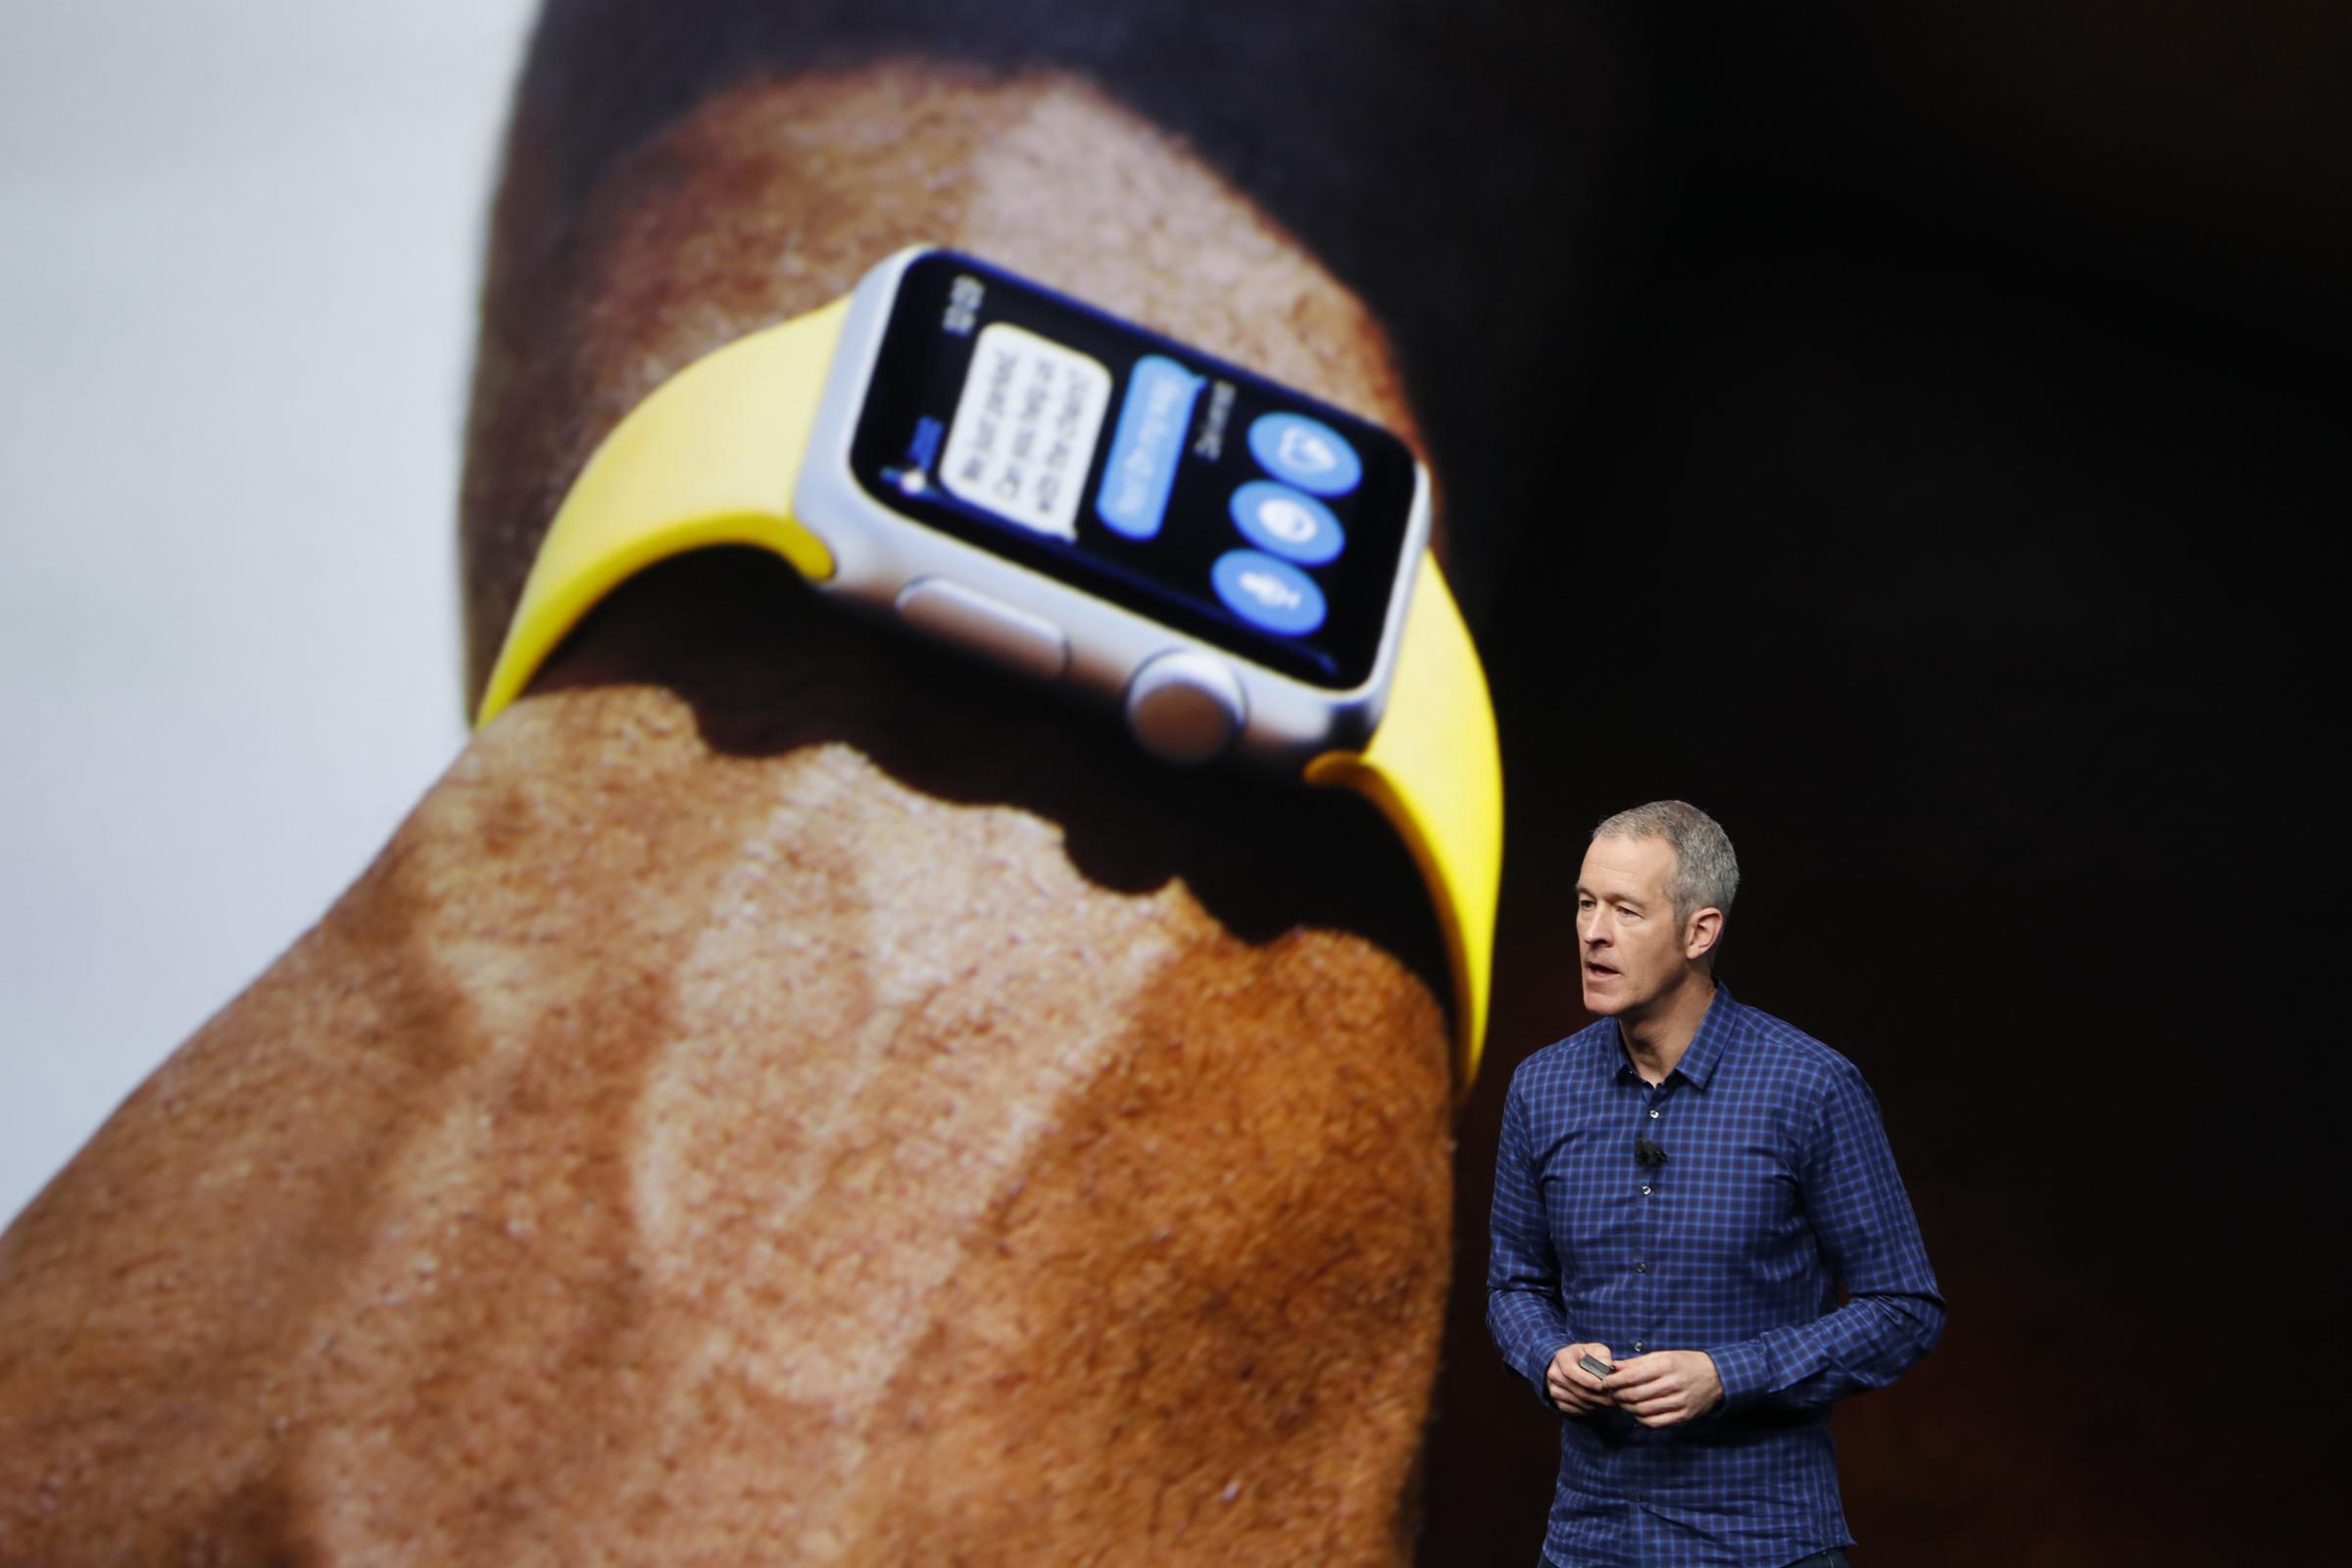 Apple makes splash with waterproof iPhones